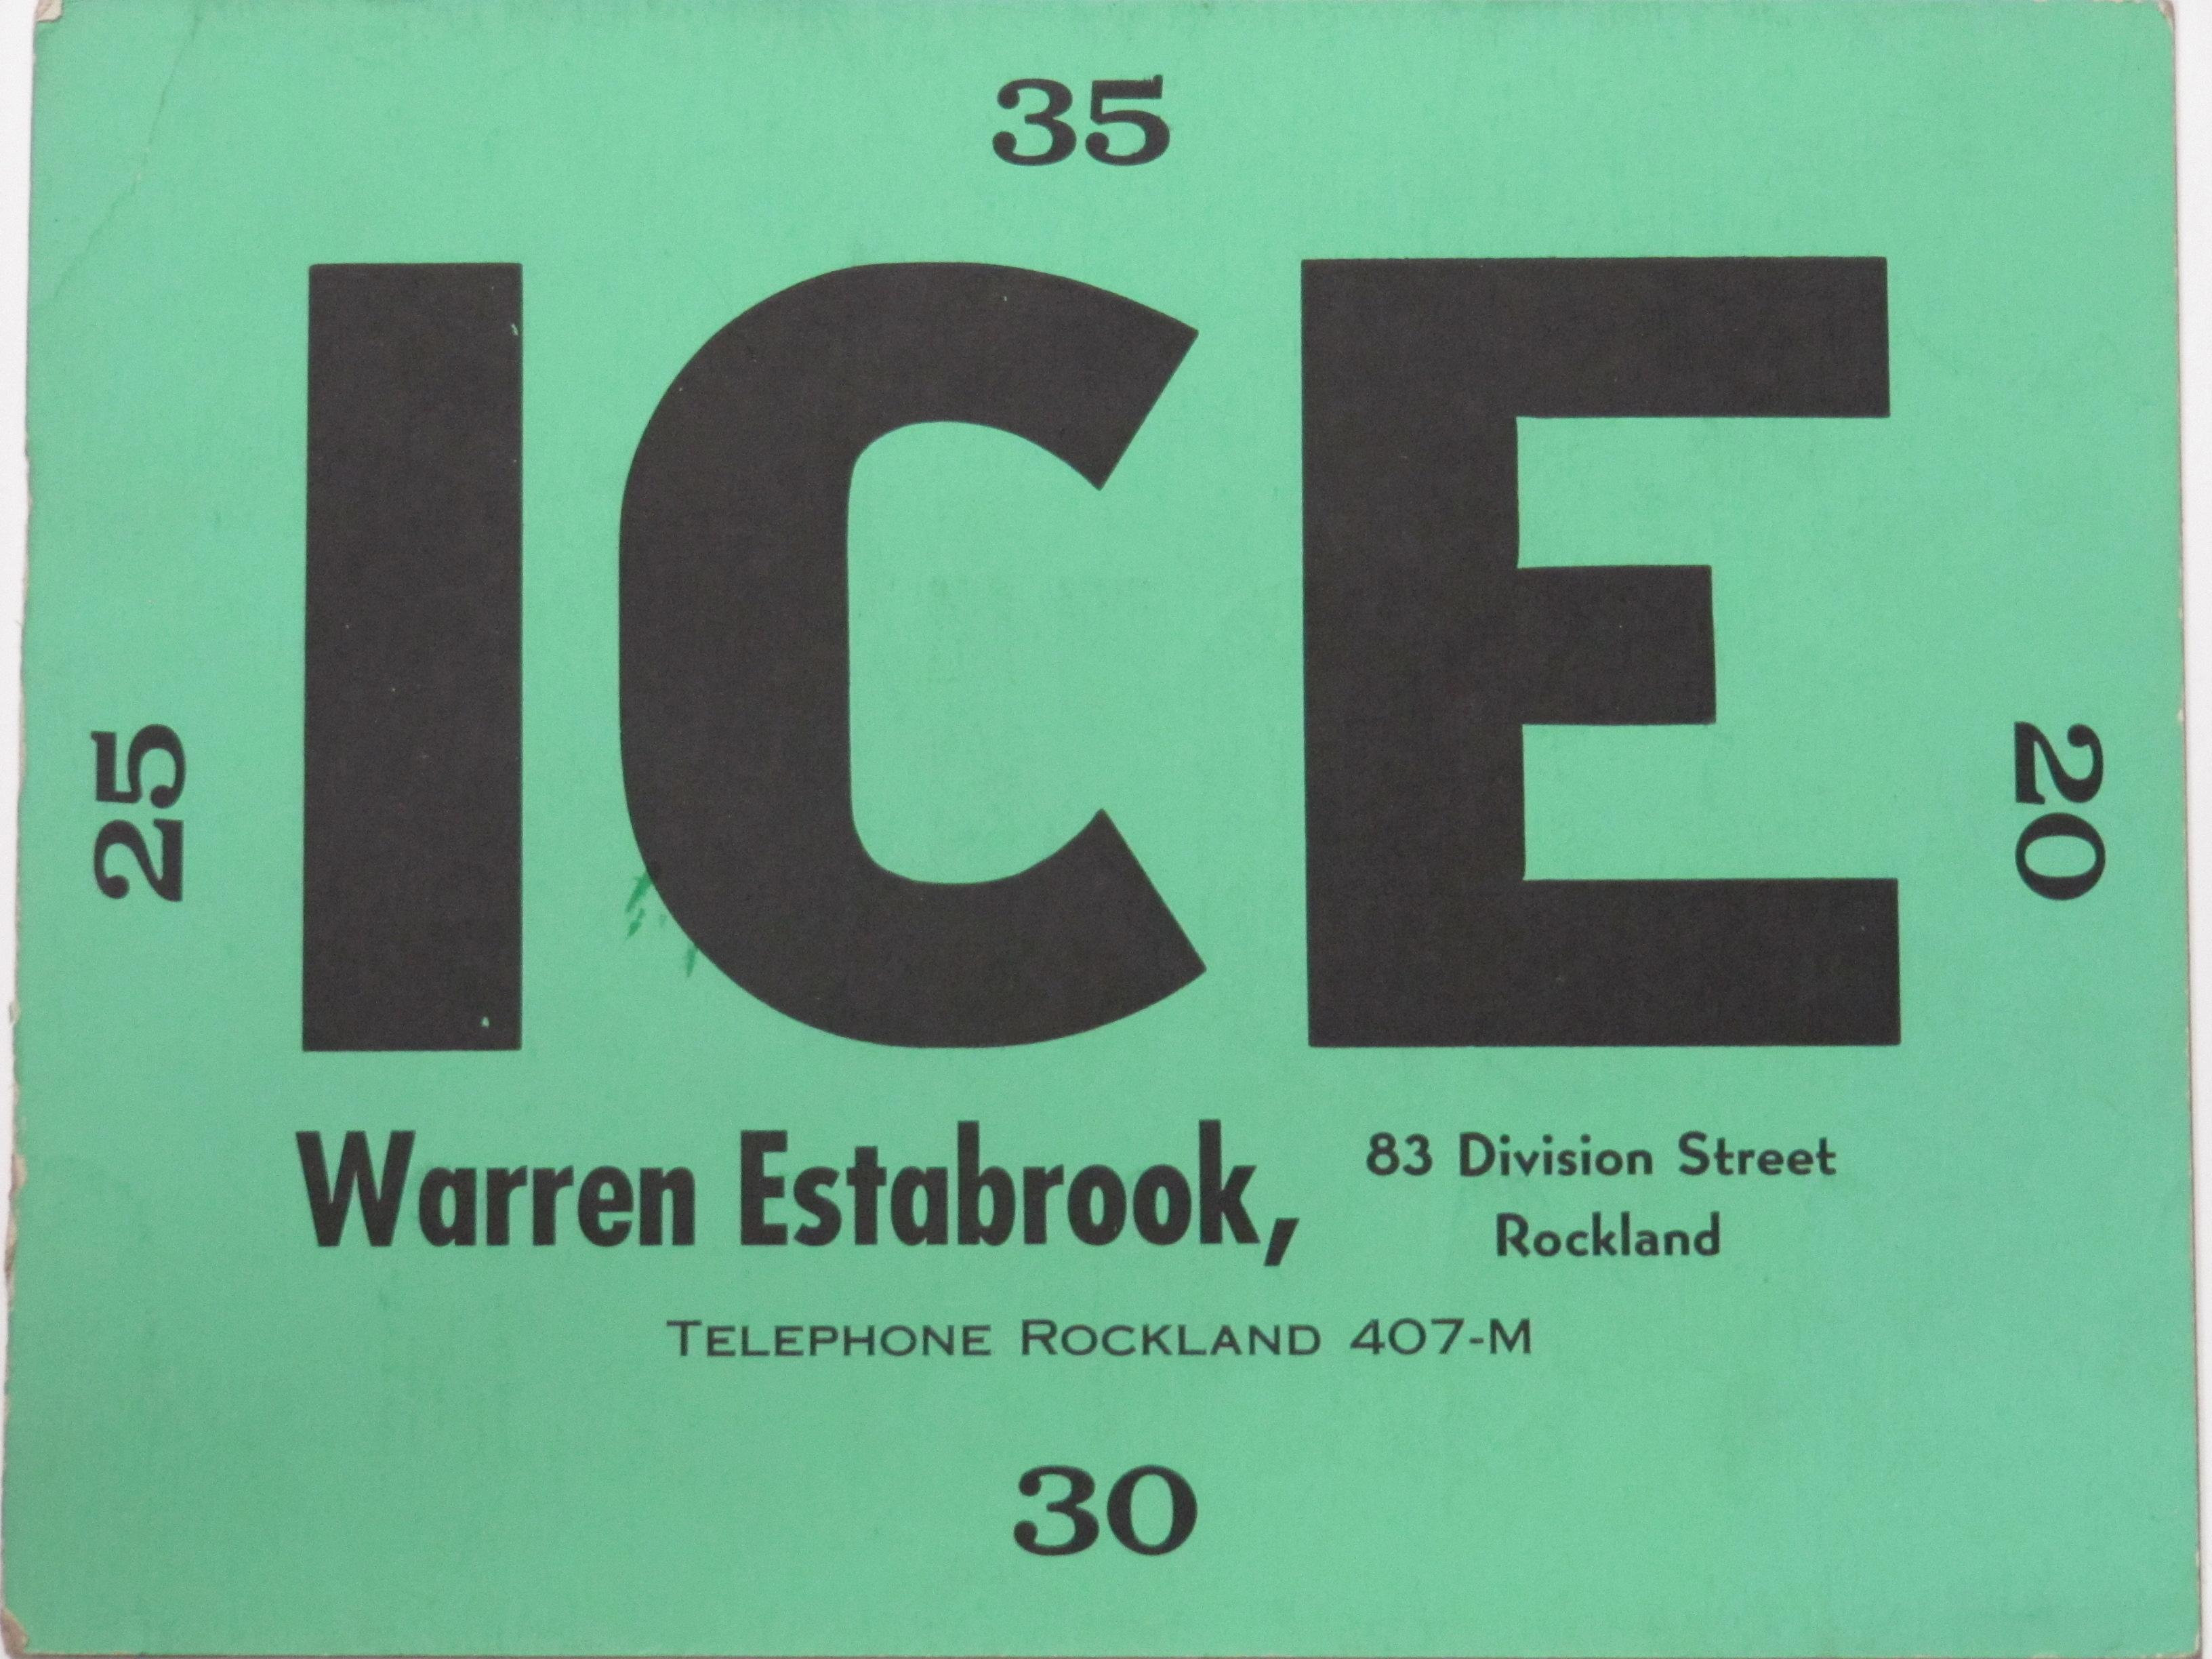 Warren Estabrook